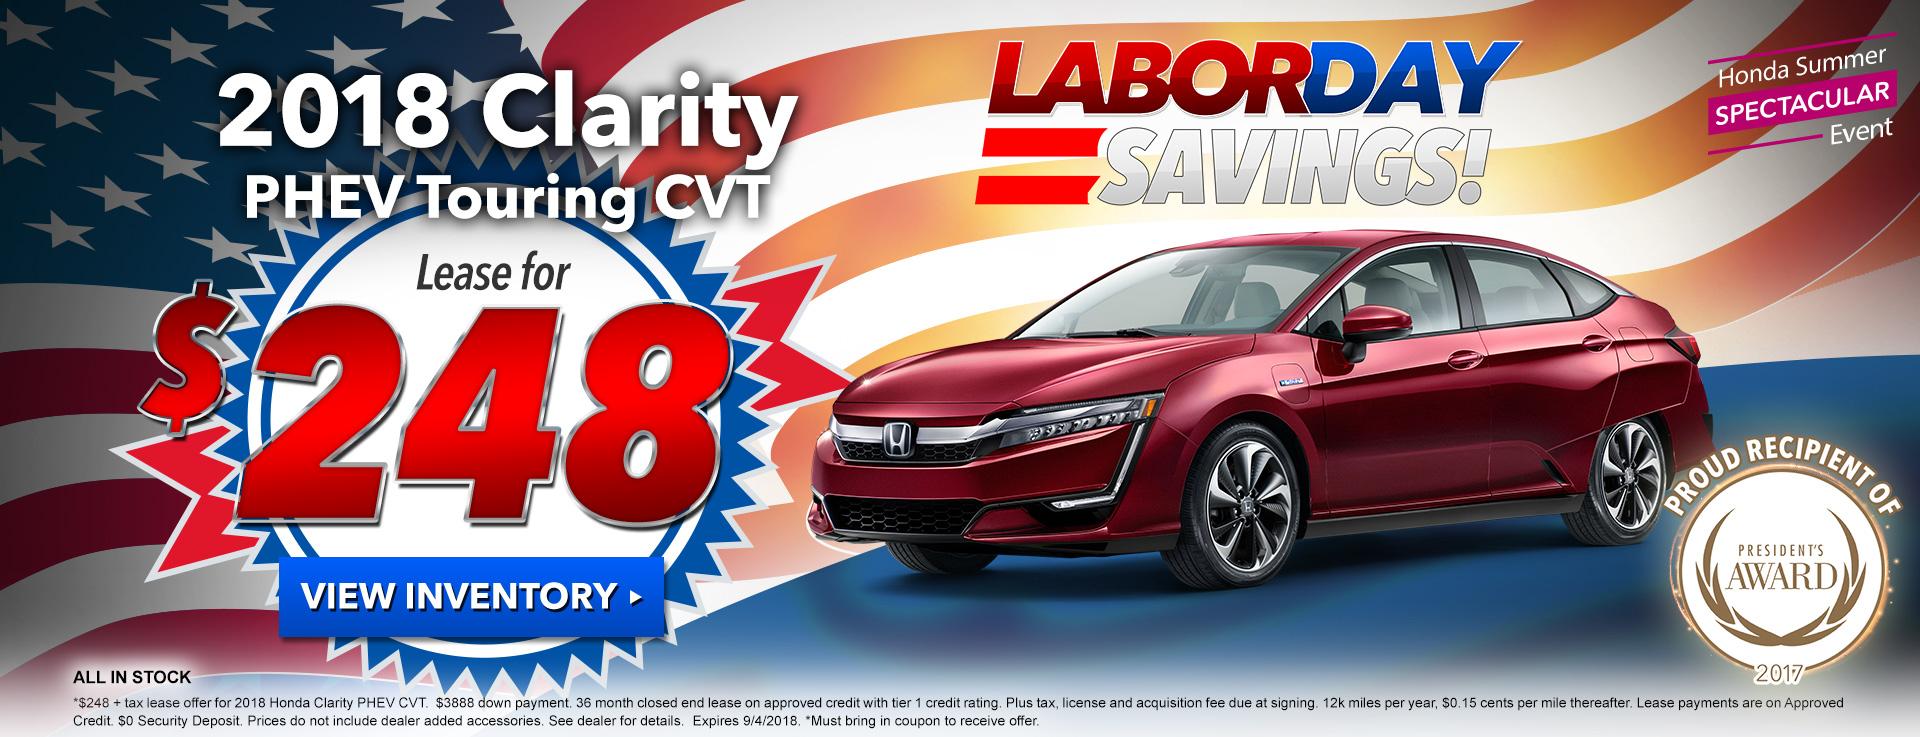 Honda Clarity 248 Lease